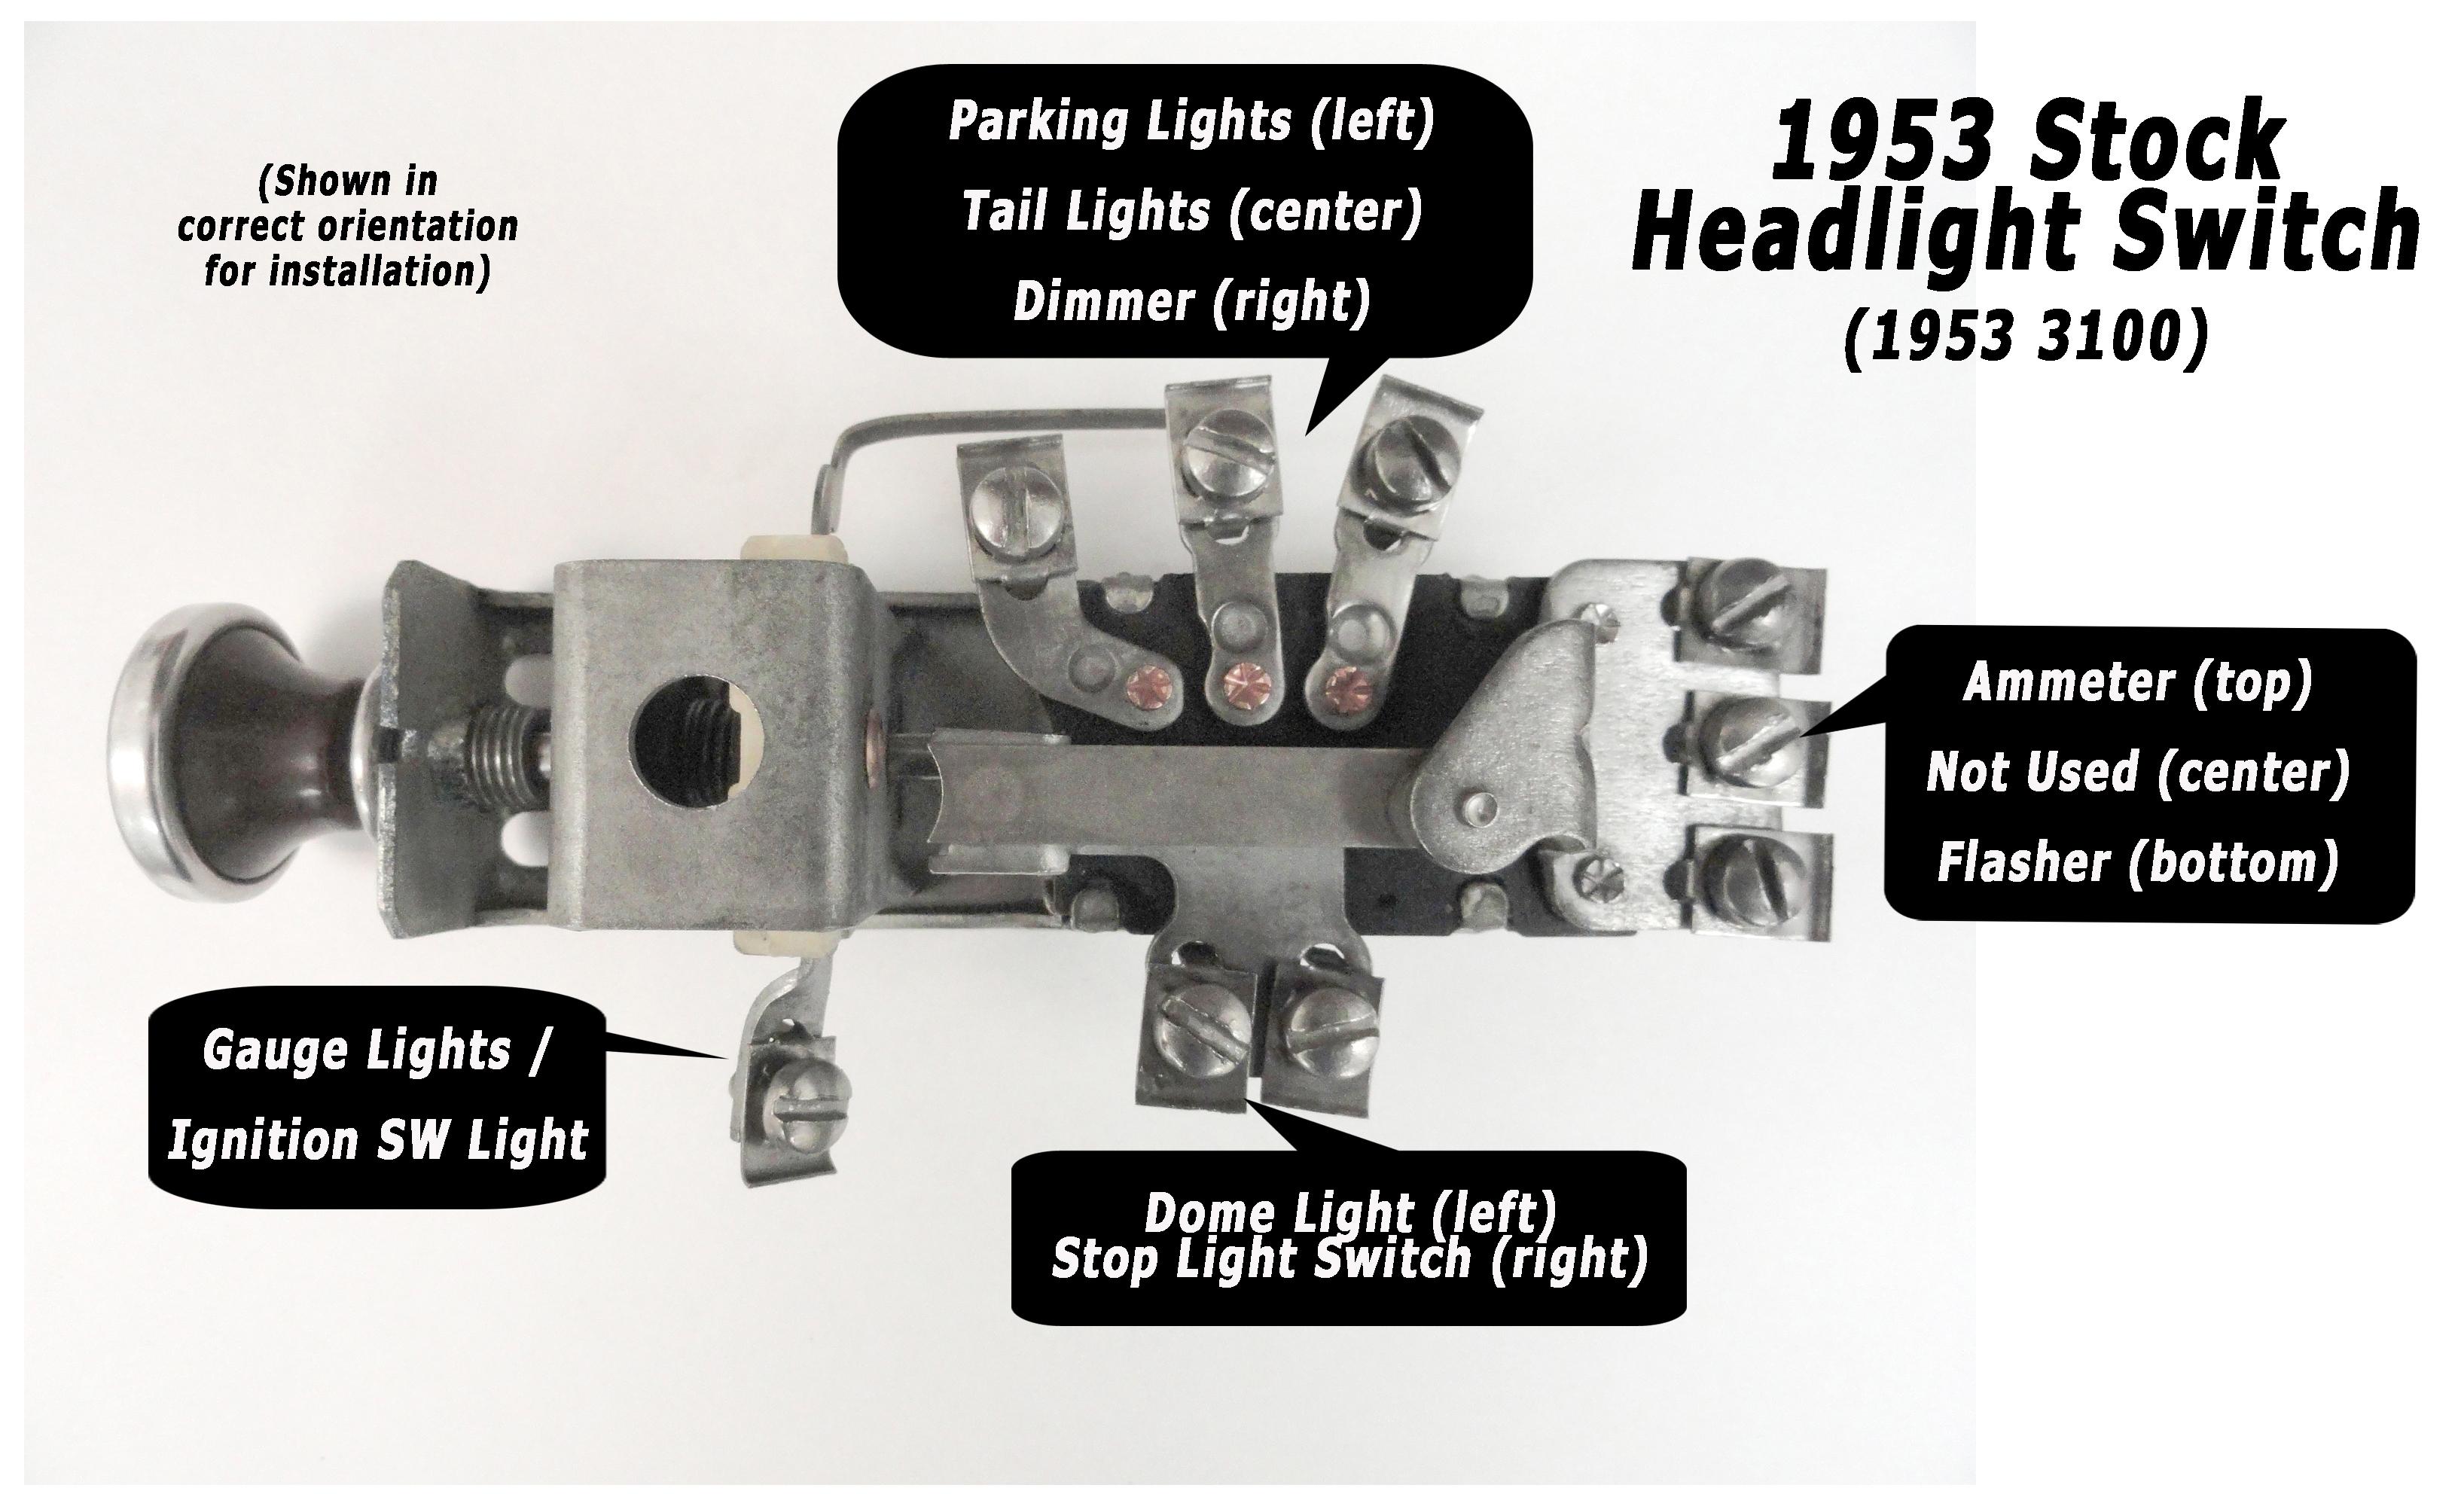 1950 Chevy Headlight Switch Wiring Diagram | Manual E-Books - Chevy Headlight Switch Wiring Diagram